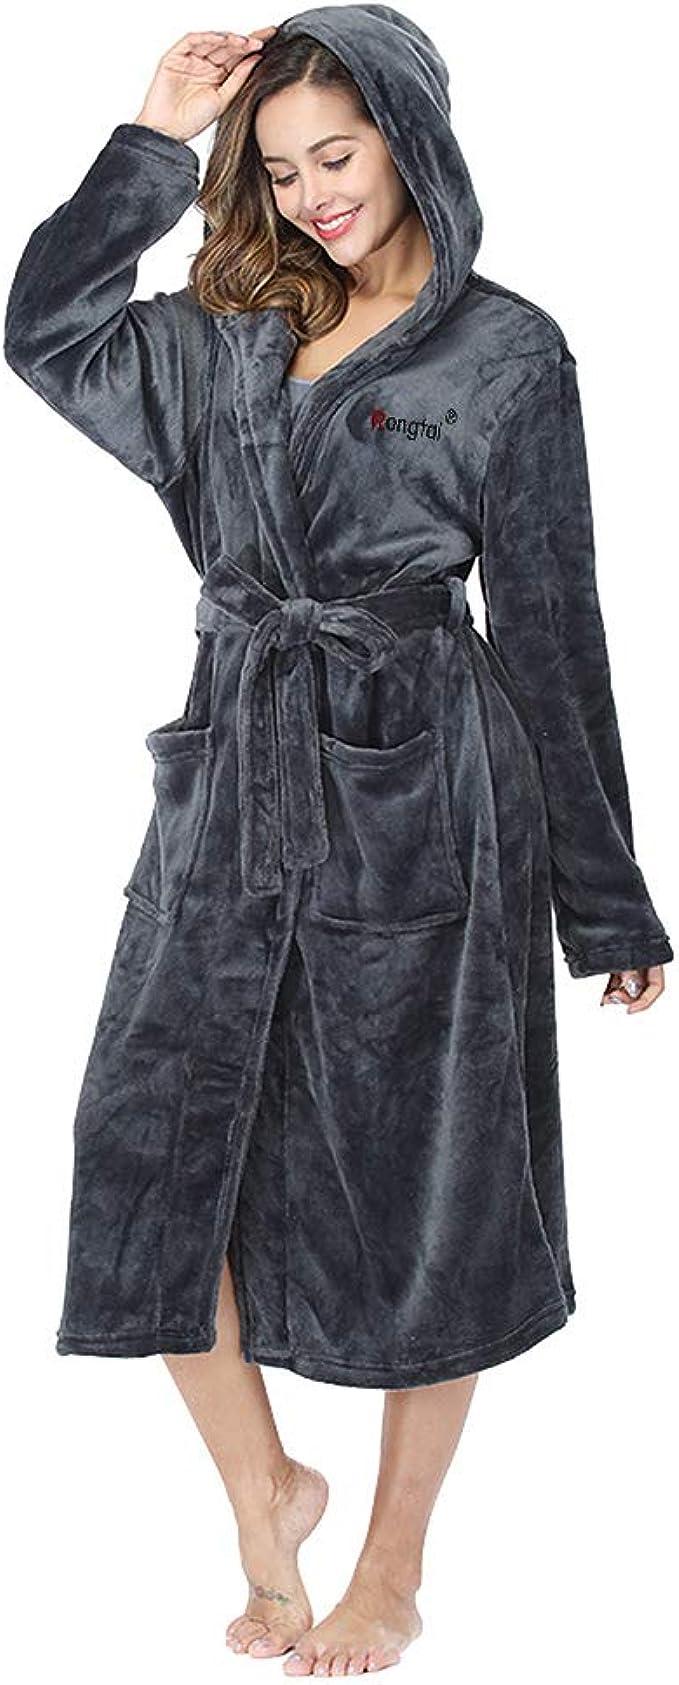 RONGTAI Fleece Robes for Women Plush Soft Warm Long Bathrobe with Pockets